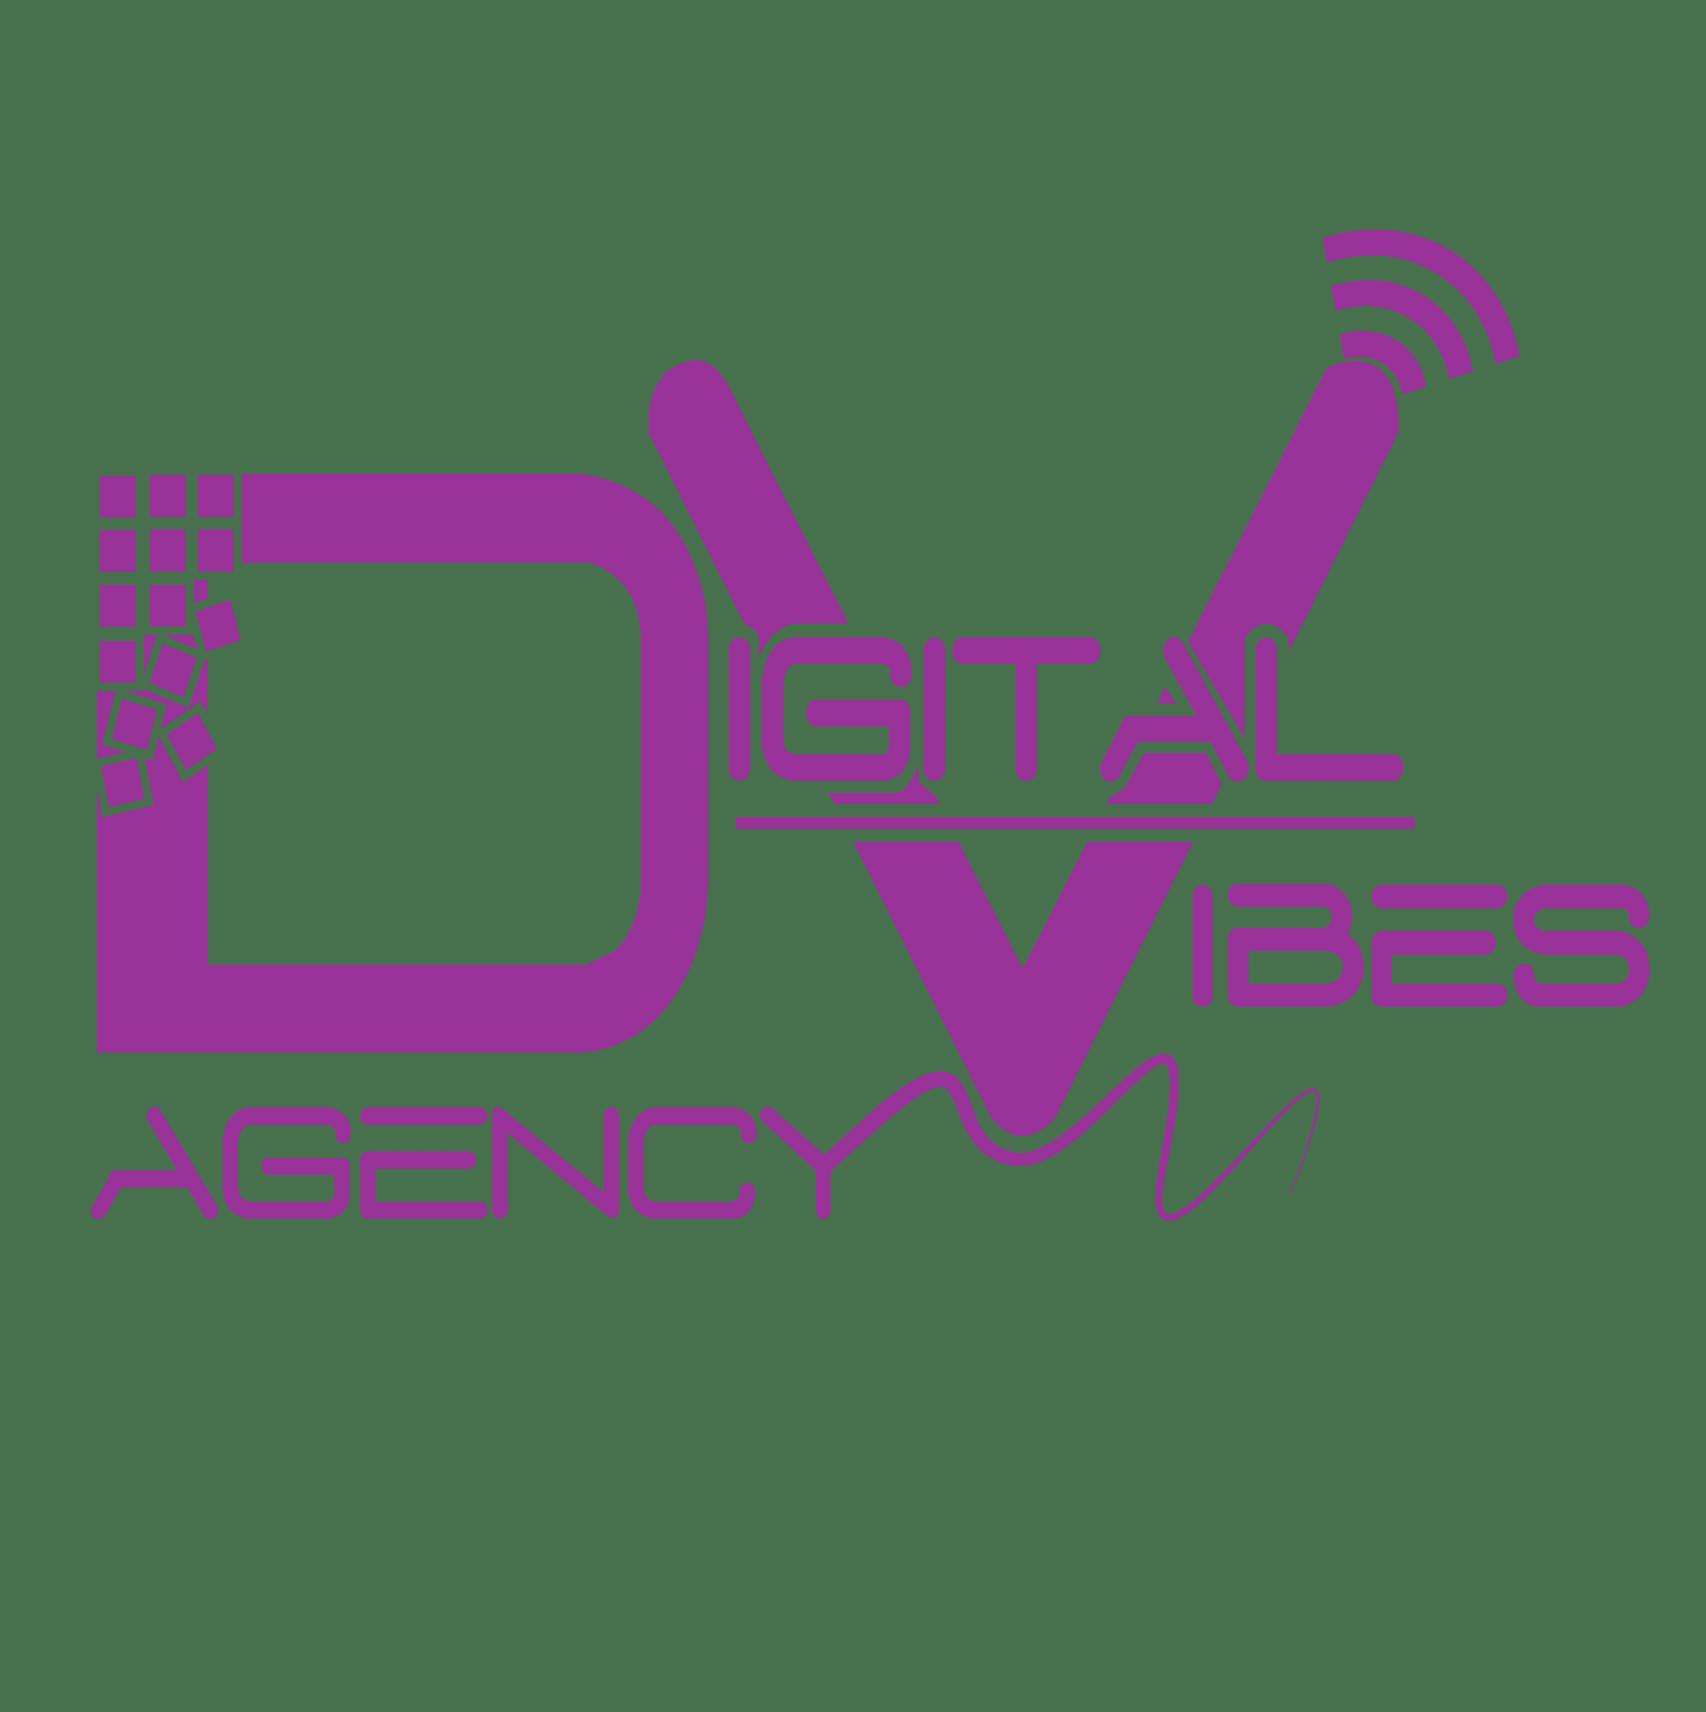 digital vibes agency marketing